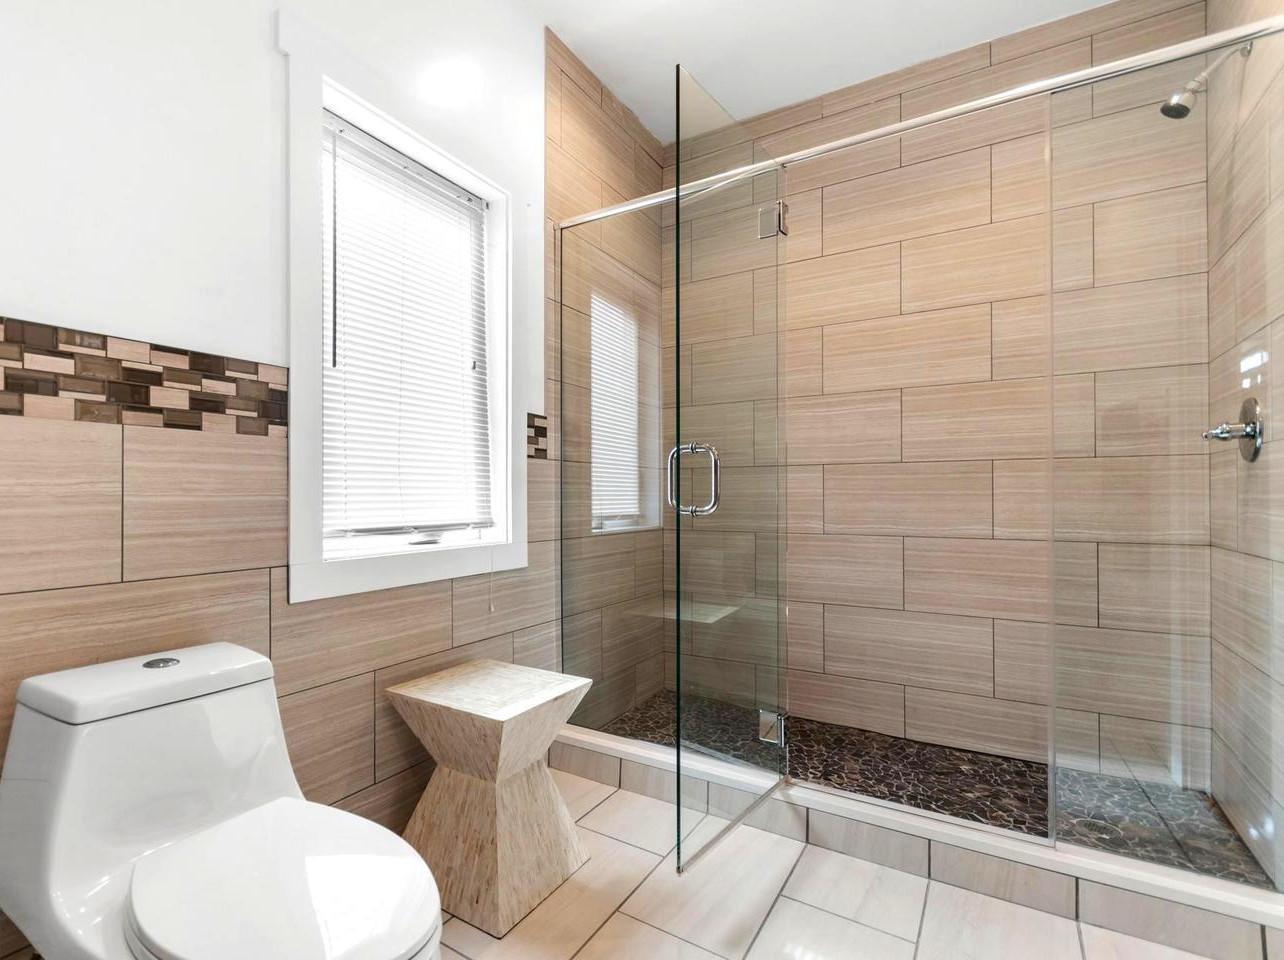 Modern Bathroom Renovation Design Tile Shower Philadelphia #livingcityarch